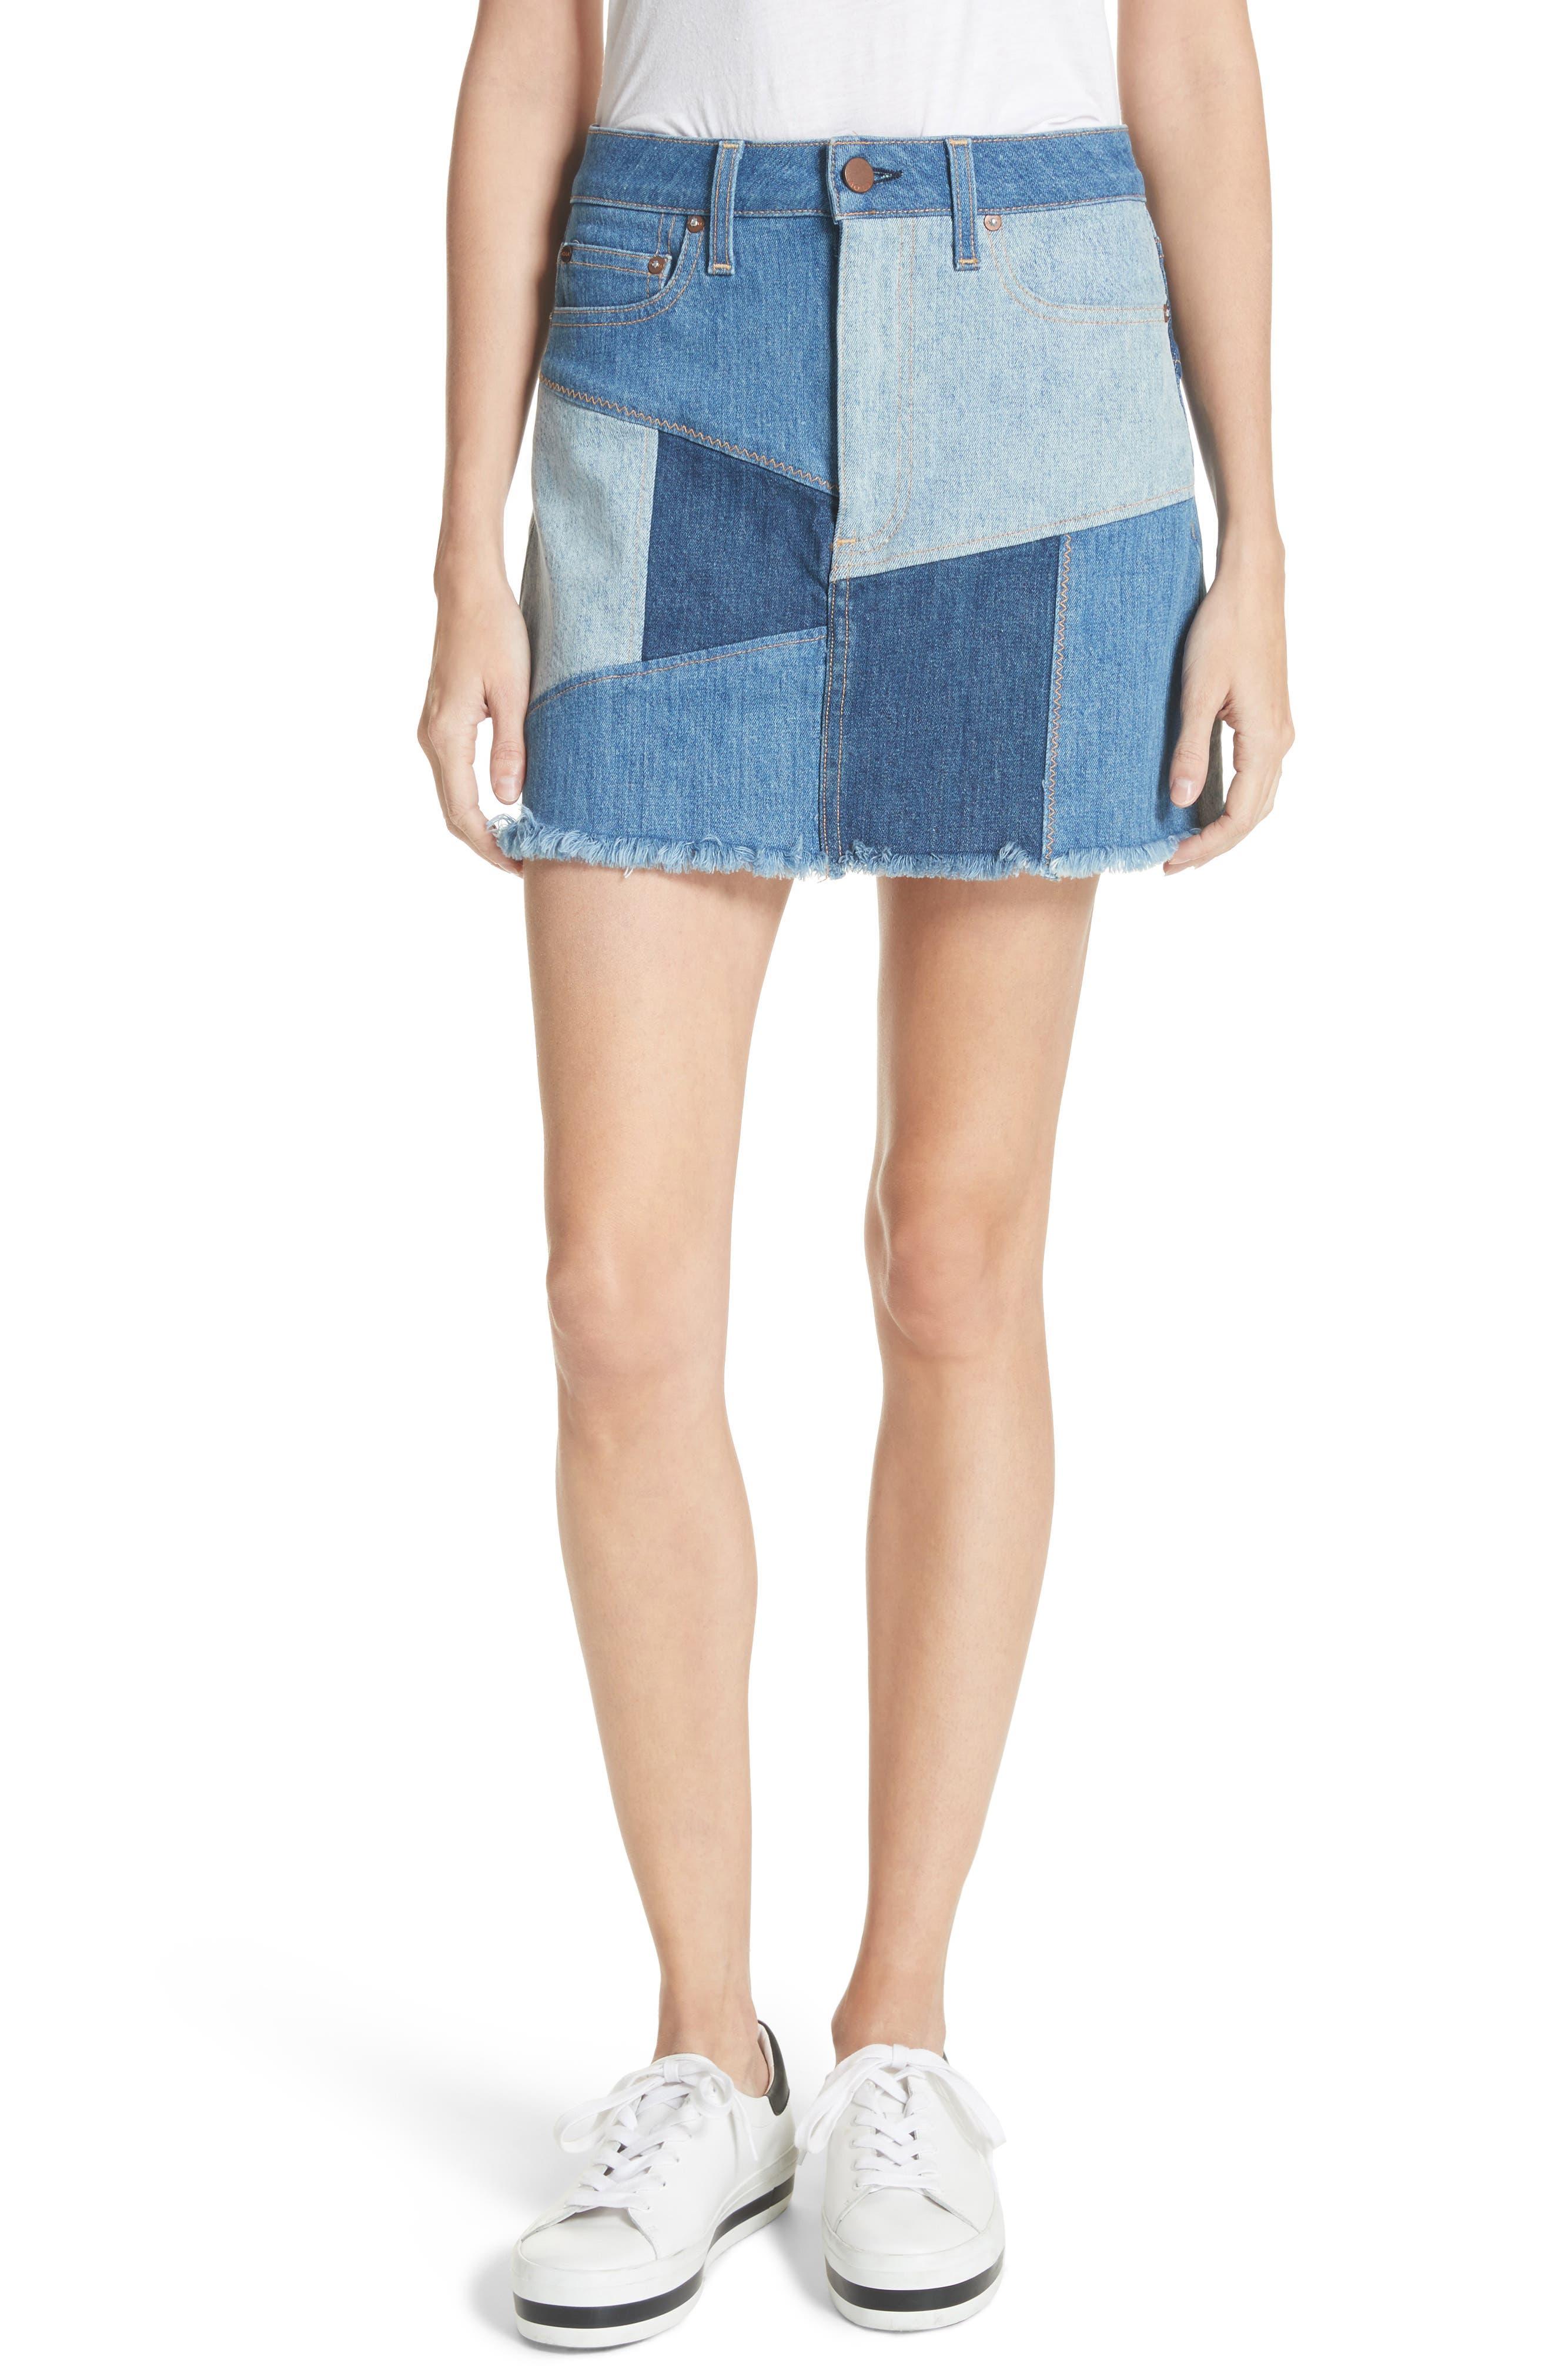 AO.LA Patchwork Denim Miniskirt,                             Main thumbnail 1, color,                             485